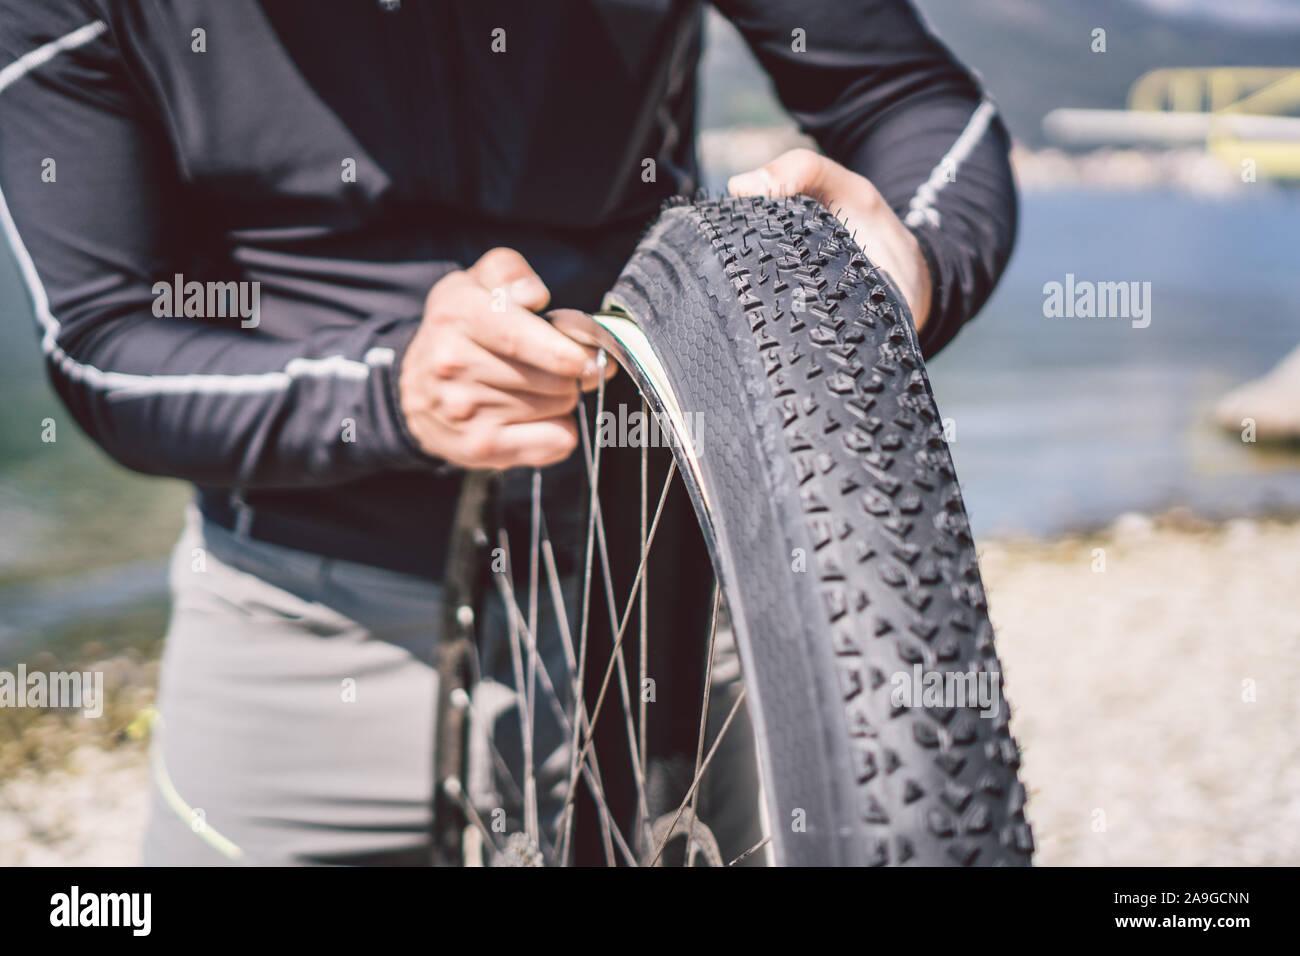 Bike Repair. Man Repairing Mountain Bike. Cyclist man in trouble rear wheel wheel case of accident. Man Fixes Bike near lake in Italy background Stock Photo